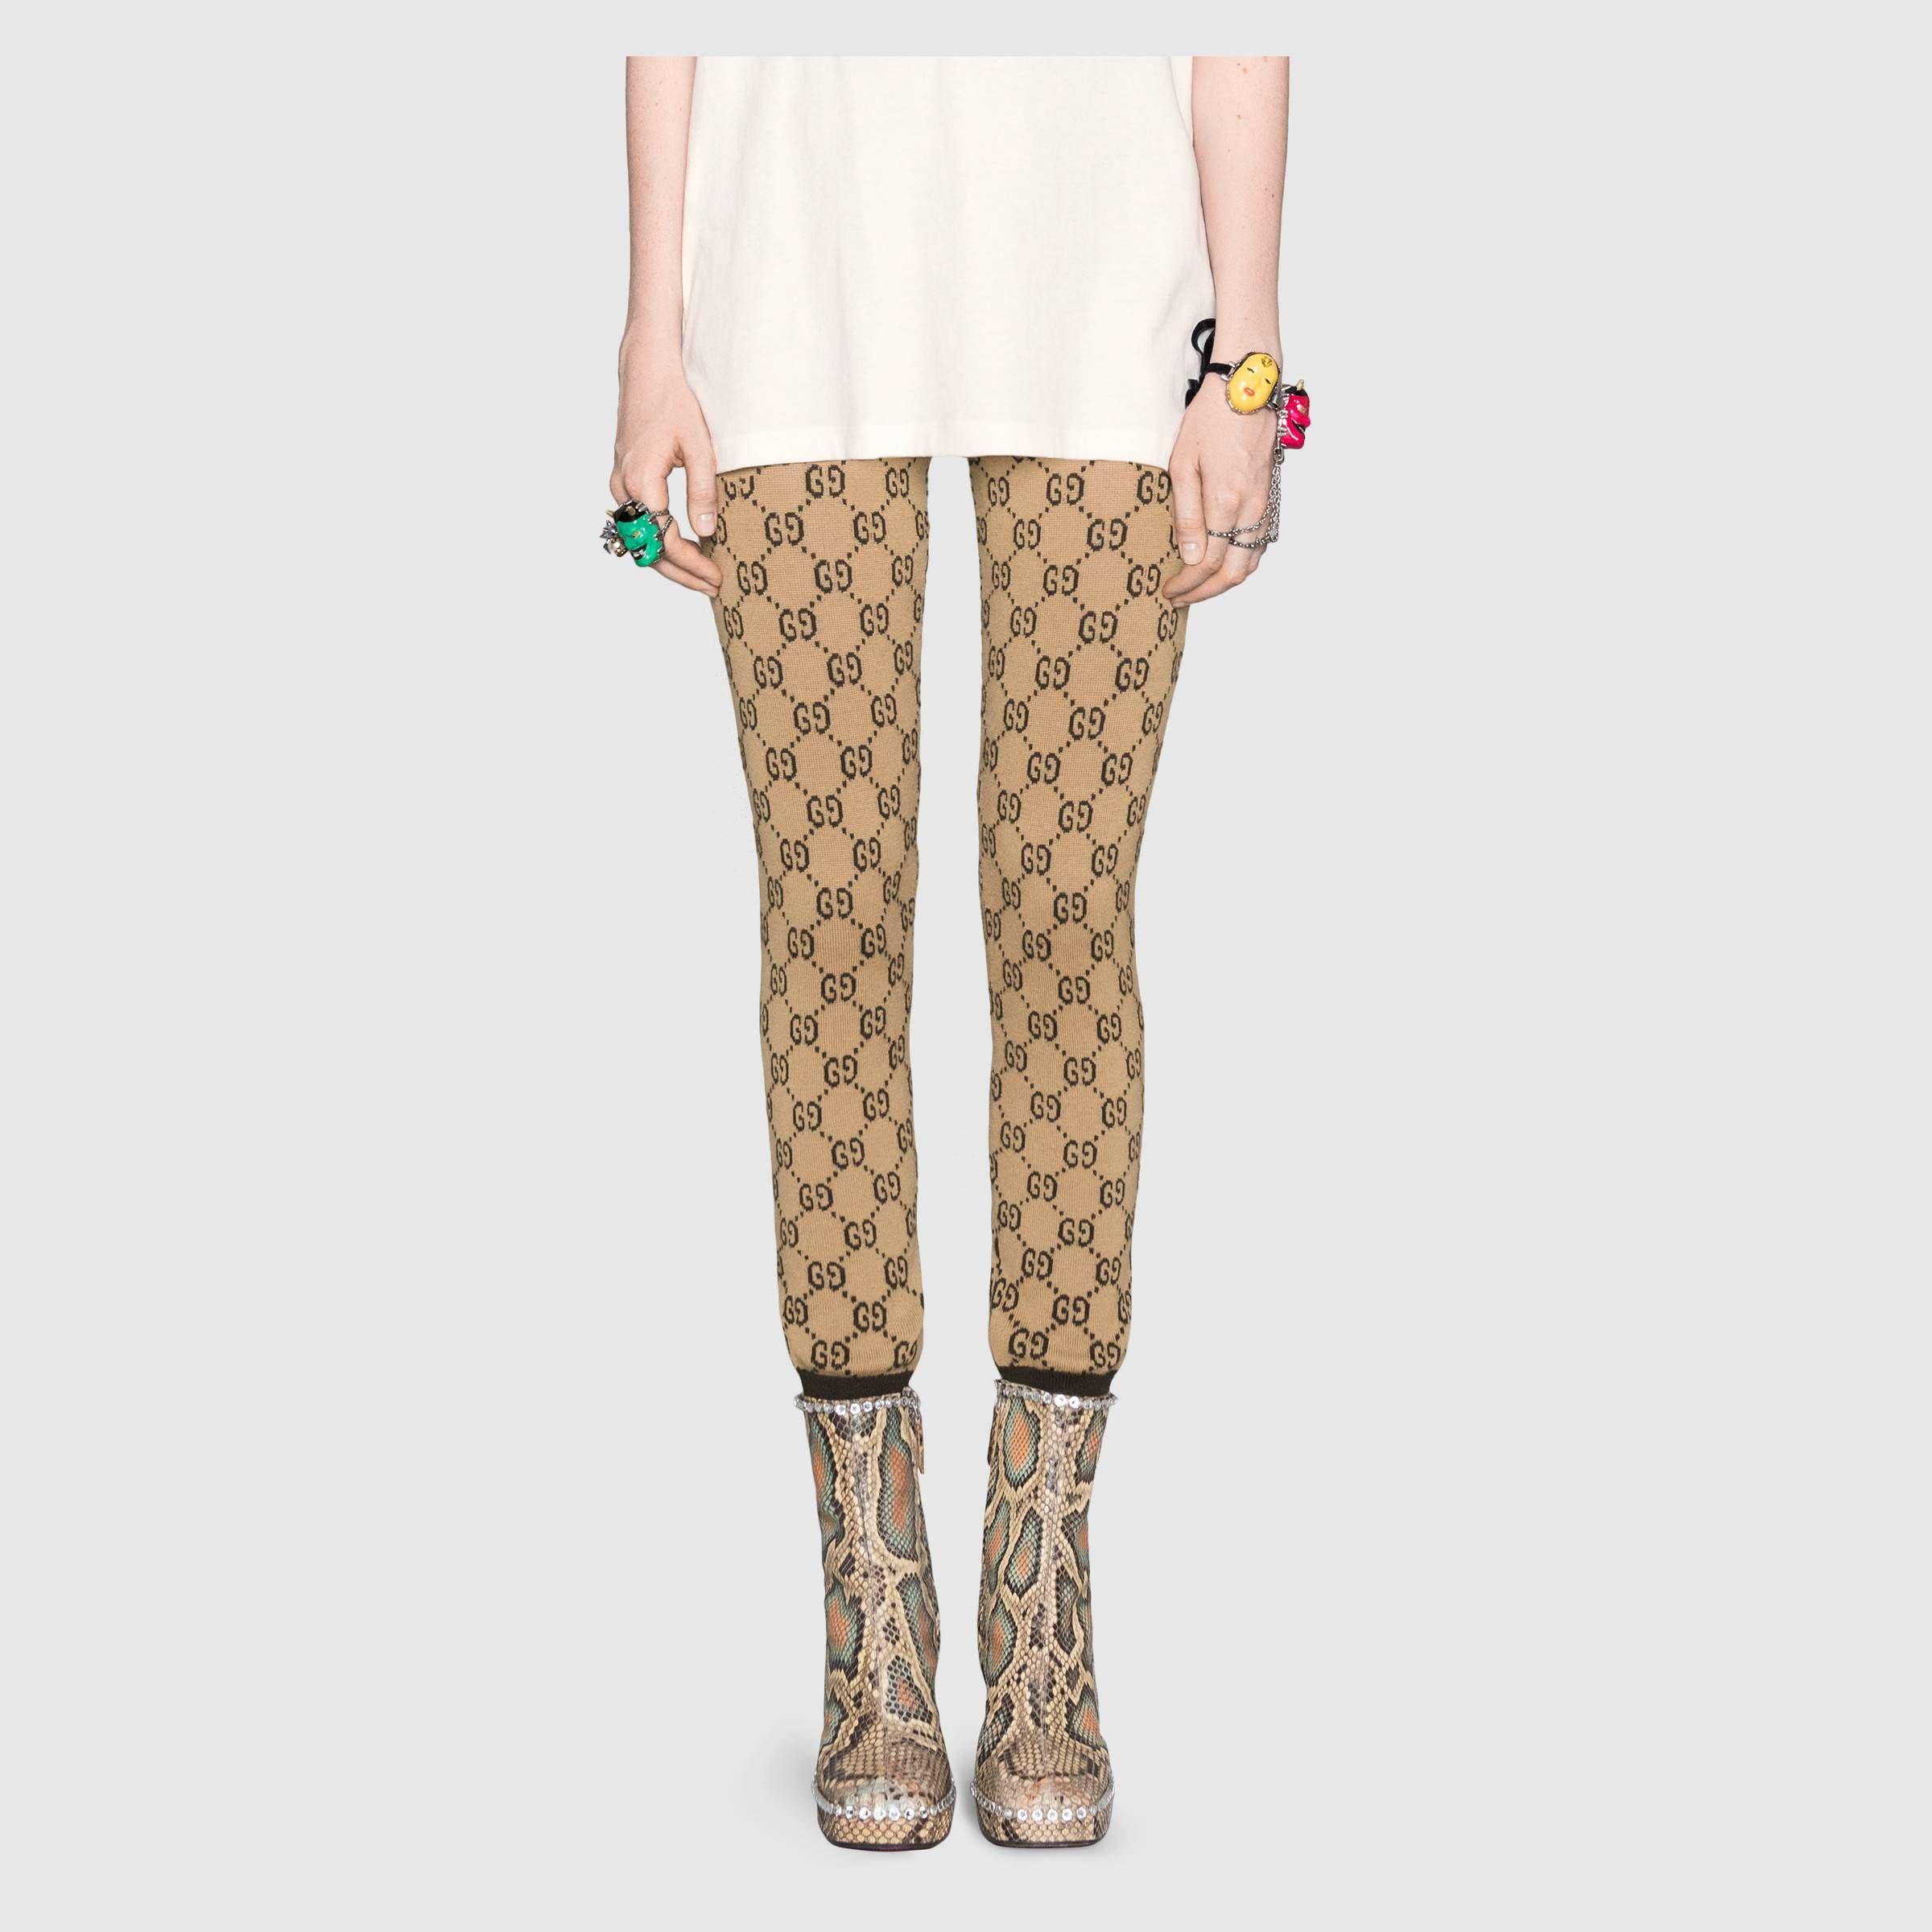 92f55872db4bf Gucci - Intarsia GG wool leggings | PANTS/SHORTS | Gucci, Leggings ...